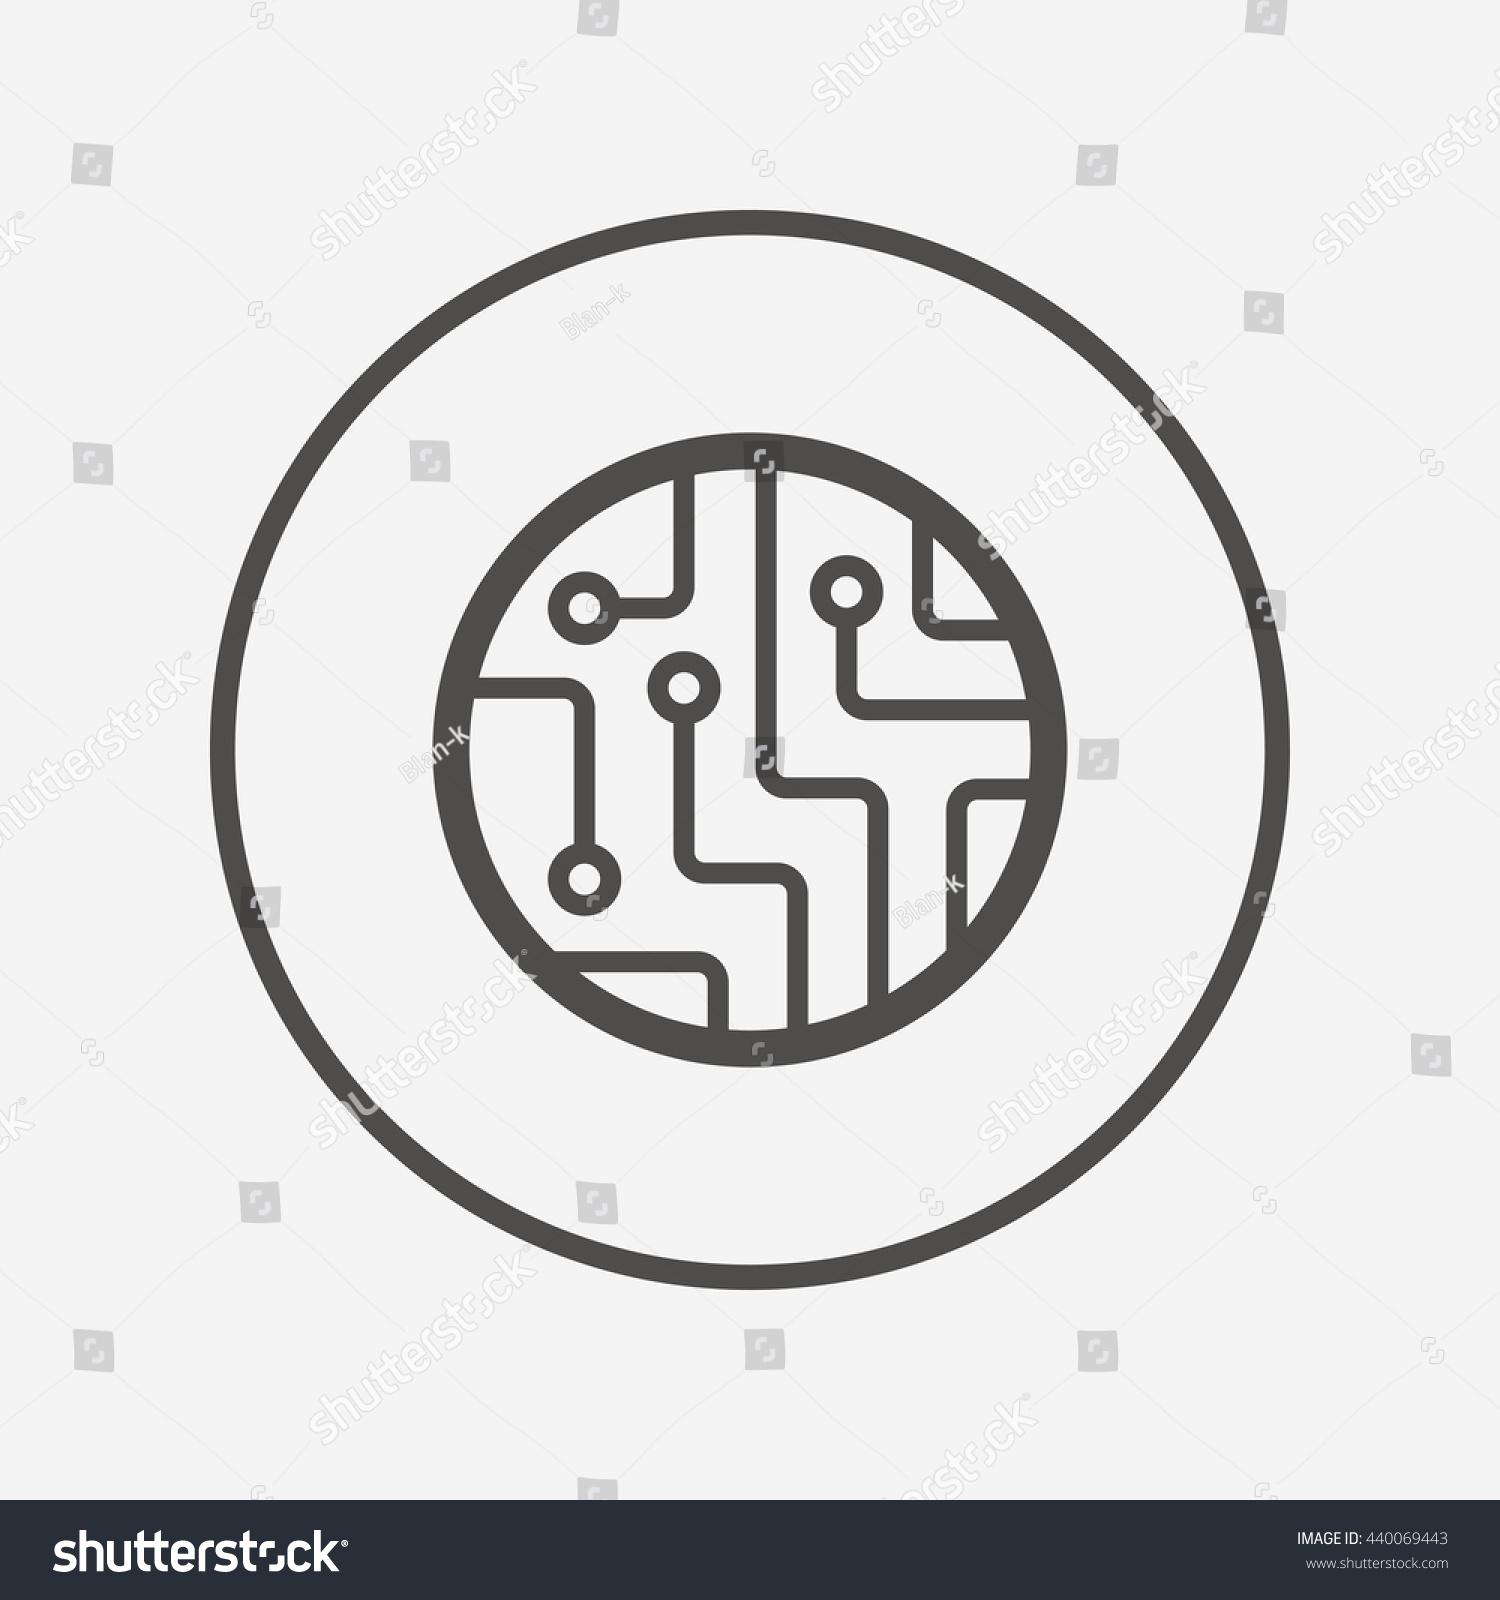 Famous Printed Circuit Board Symbols Image - Electrical Diagram ...